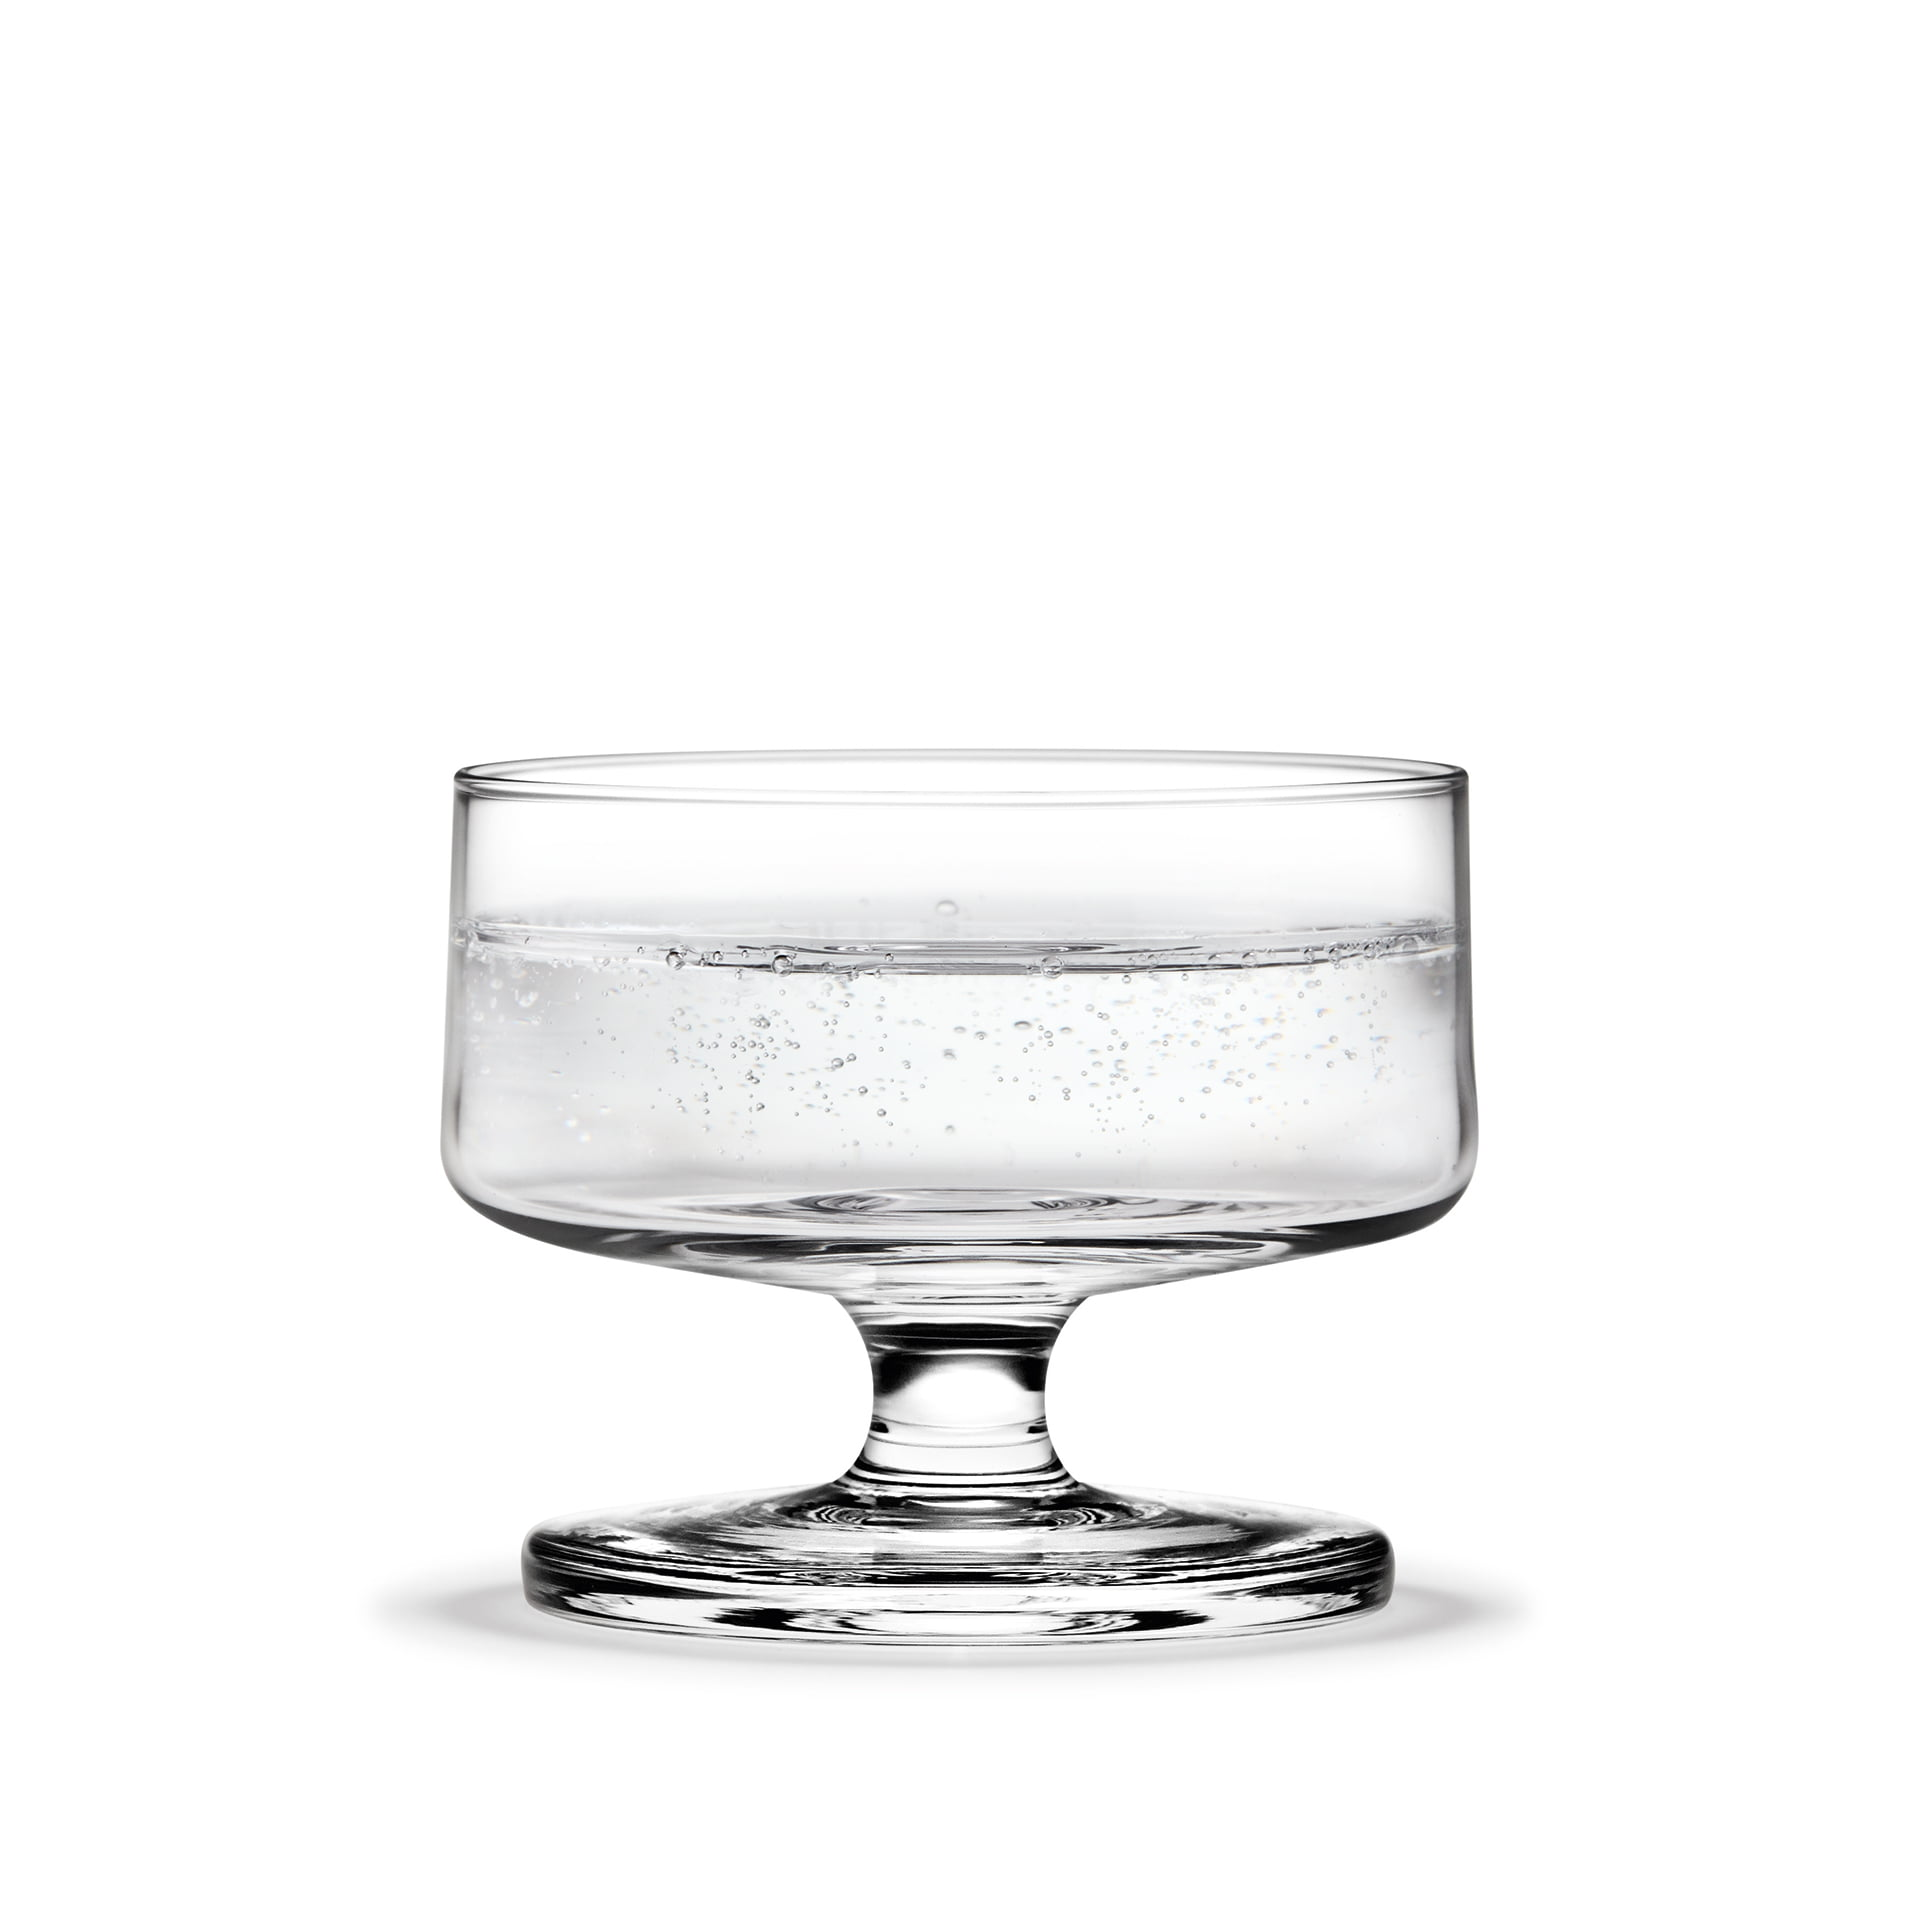 Stub glas dessert